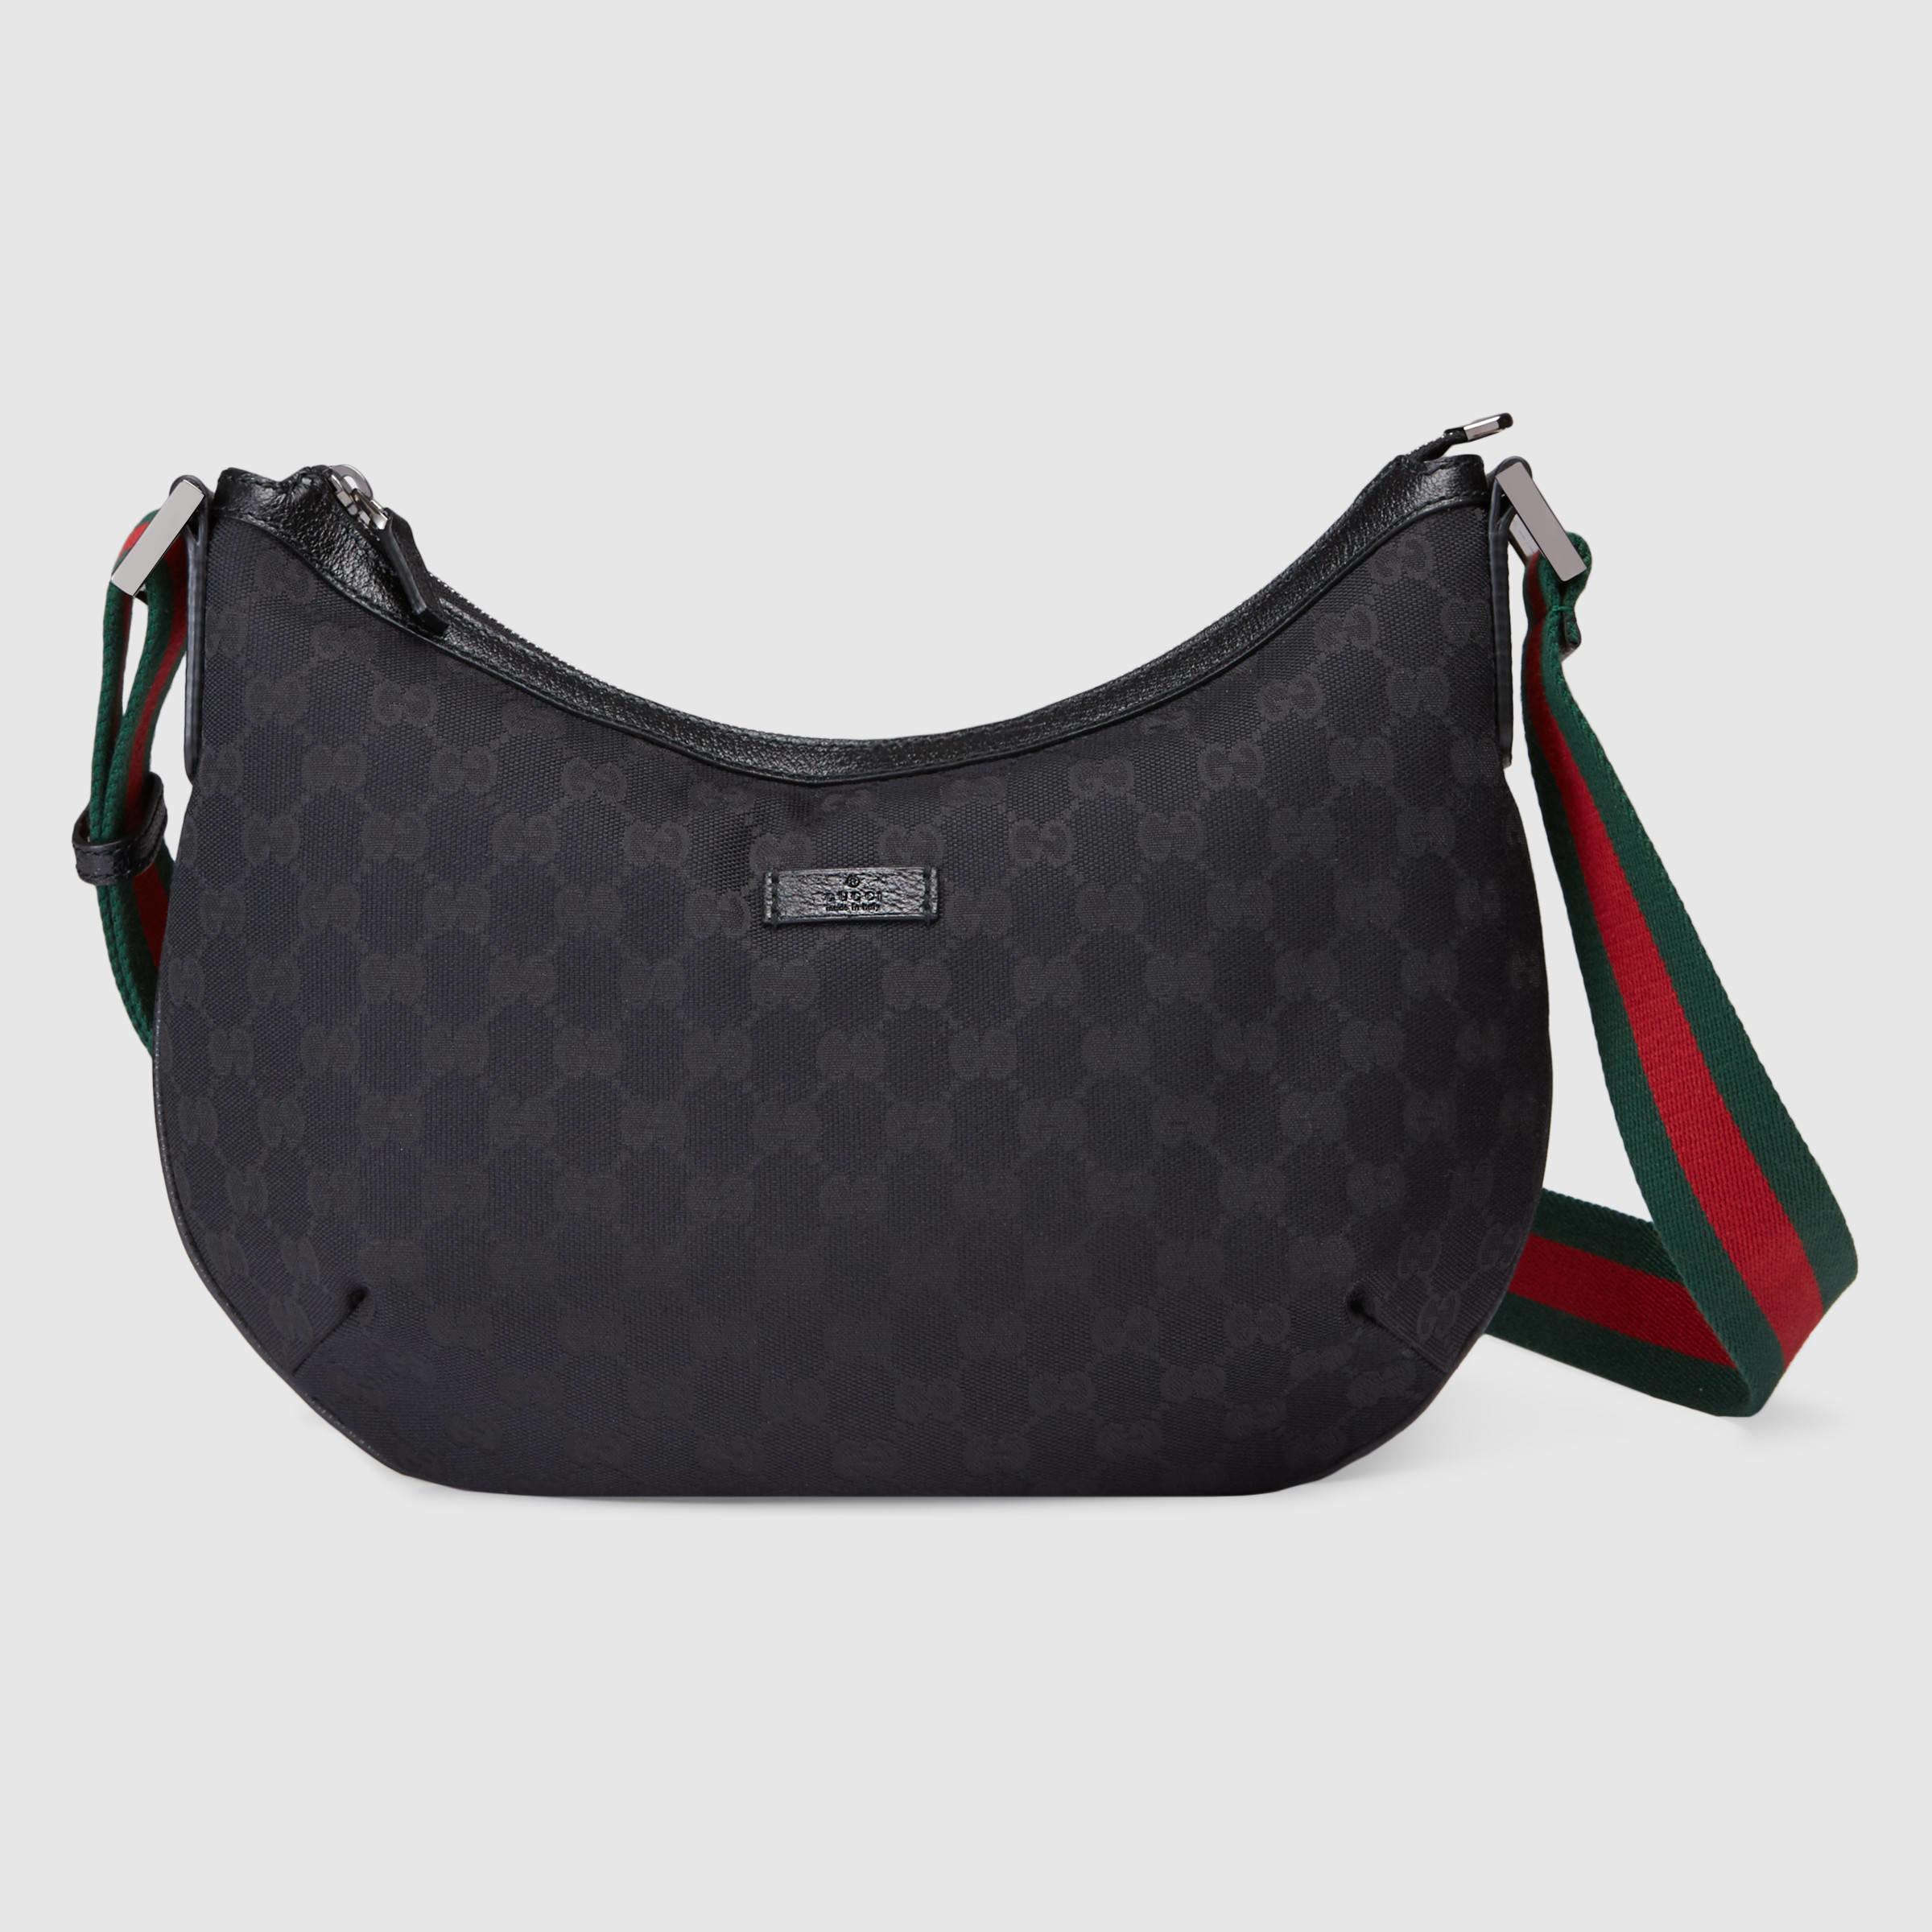 a85a5499978 Gucci Original Gg Canvas Messenger Bag in Green for Men - Lyst